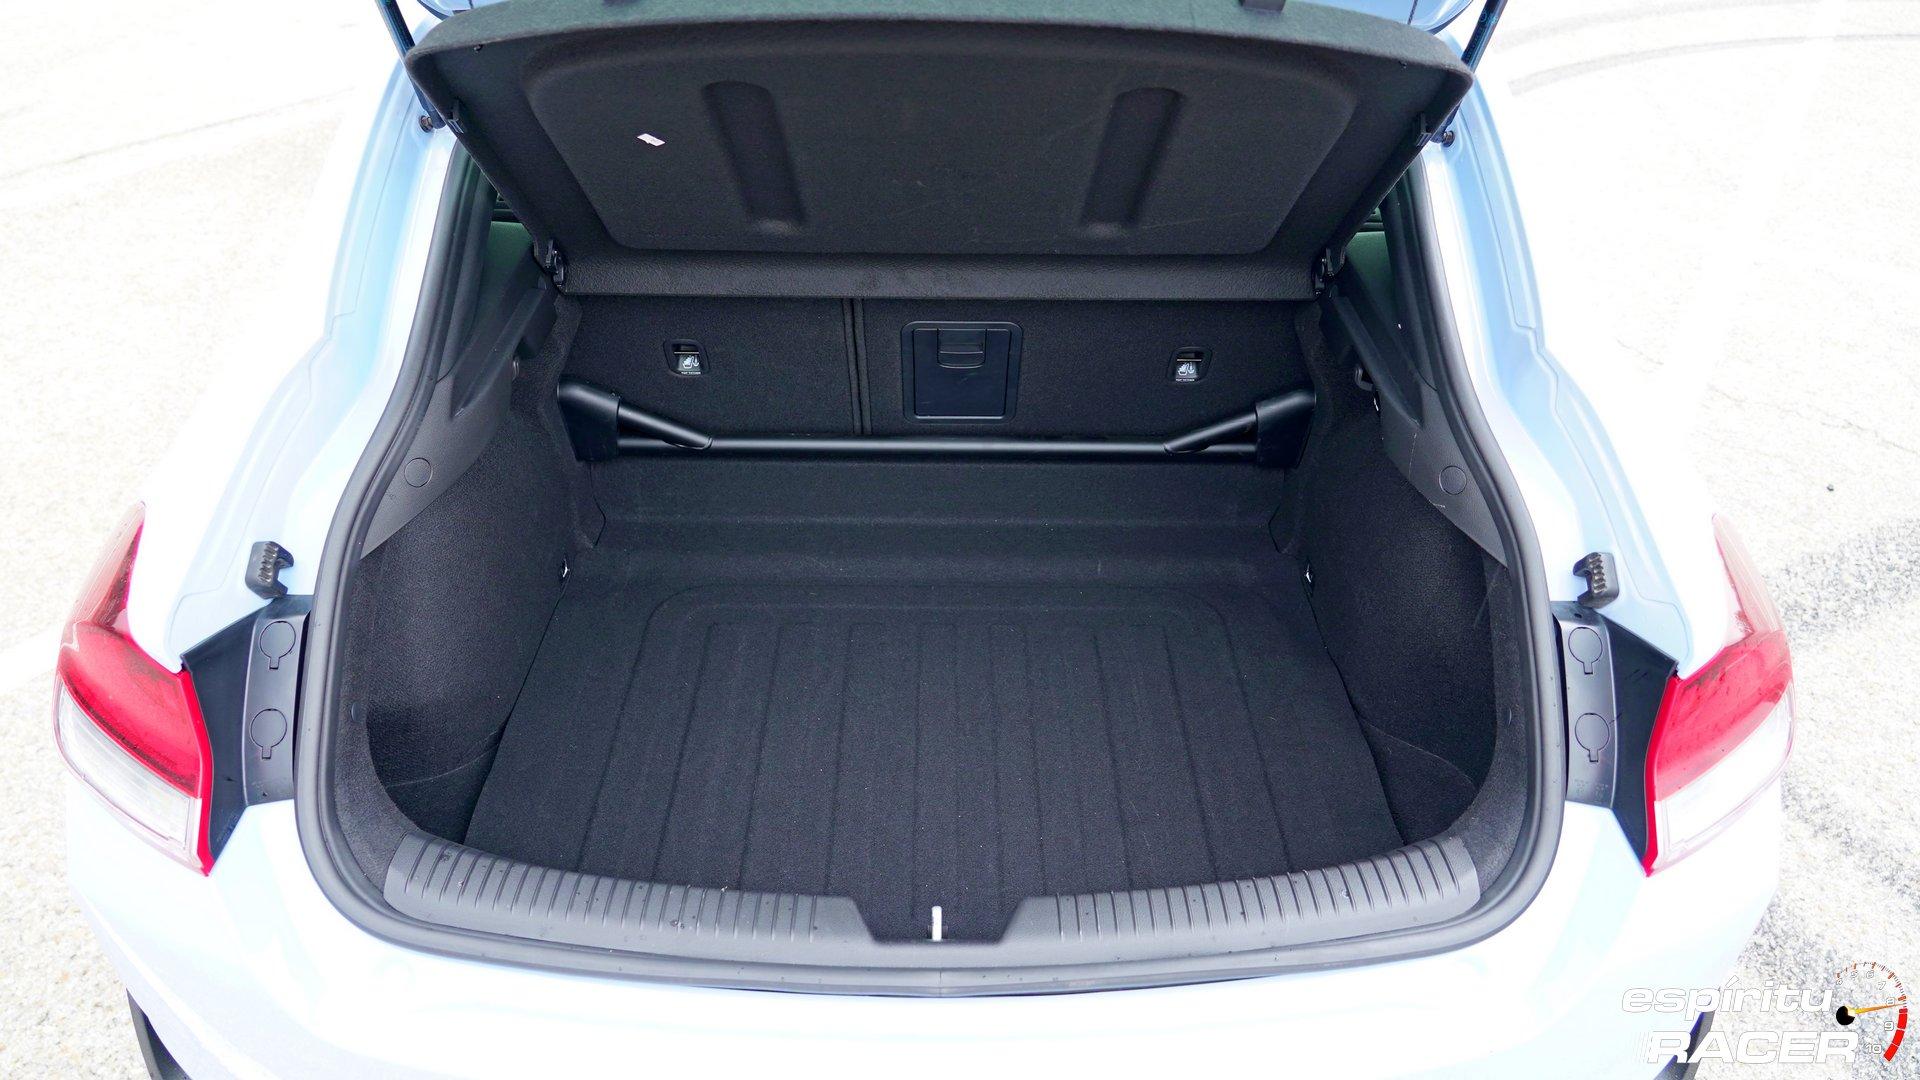 Hyundai i30 N Fastback 2019 48